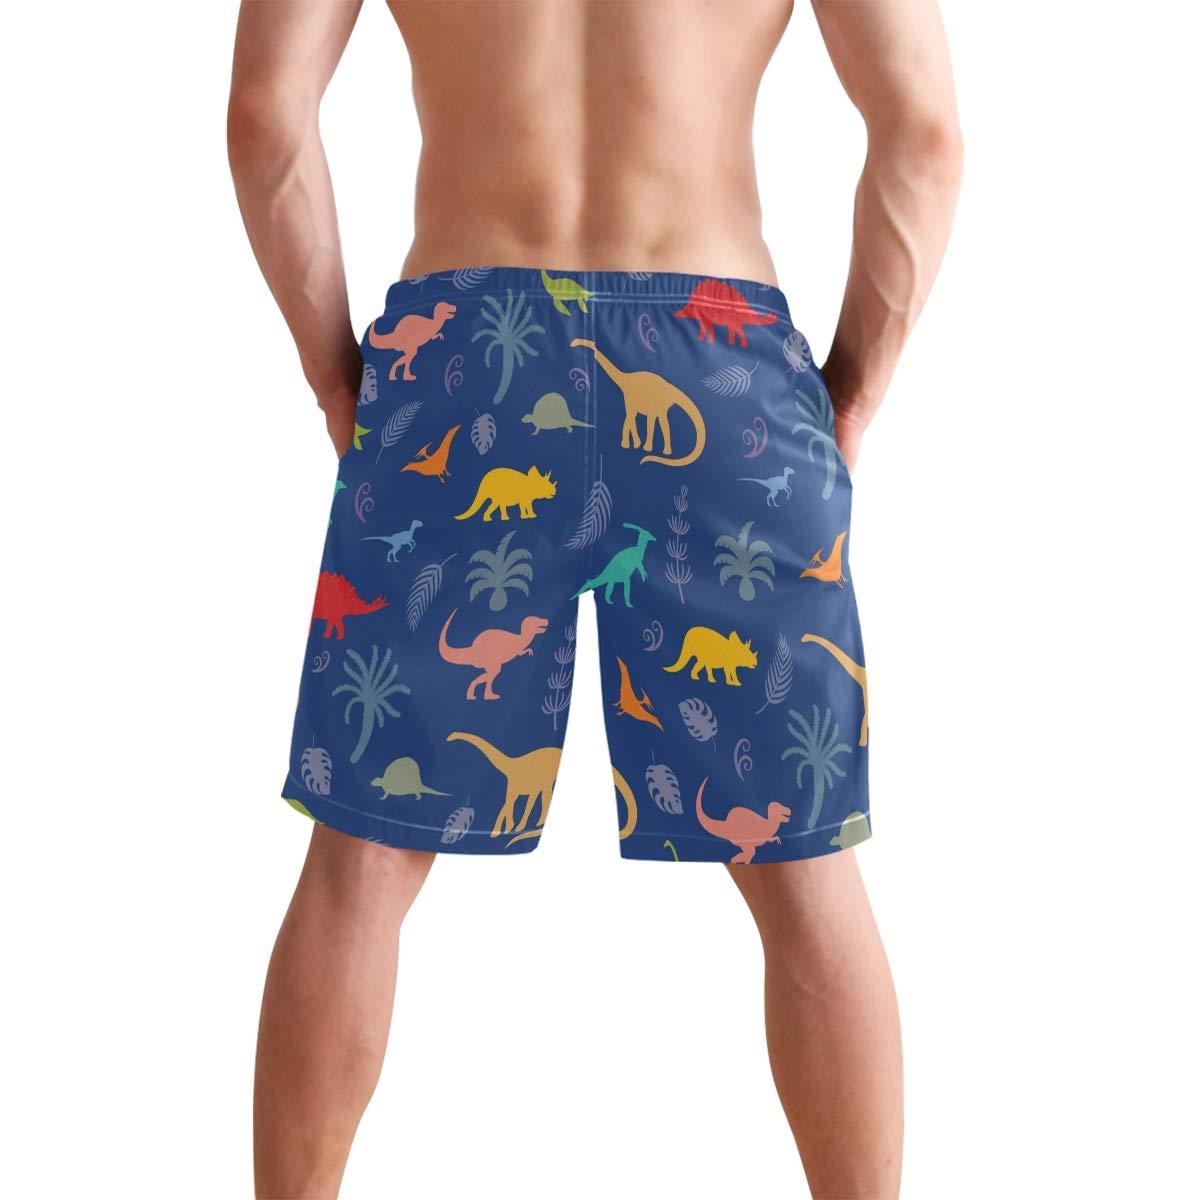 WIHVE Mens Beach Swim Trunks Cartoon Dinosaurs Plants Leaves Boxer Swimsuit Underwear Board Shorts with Pocket